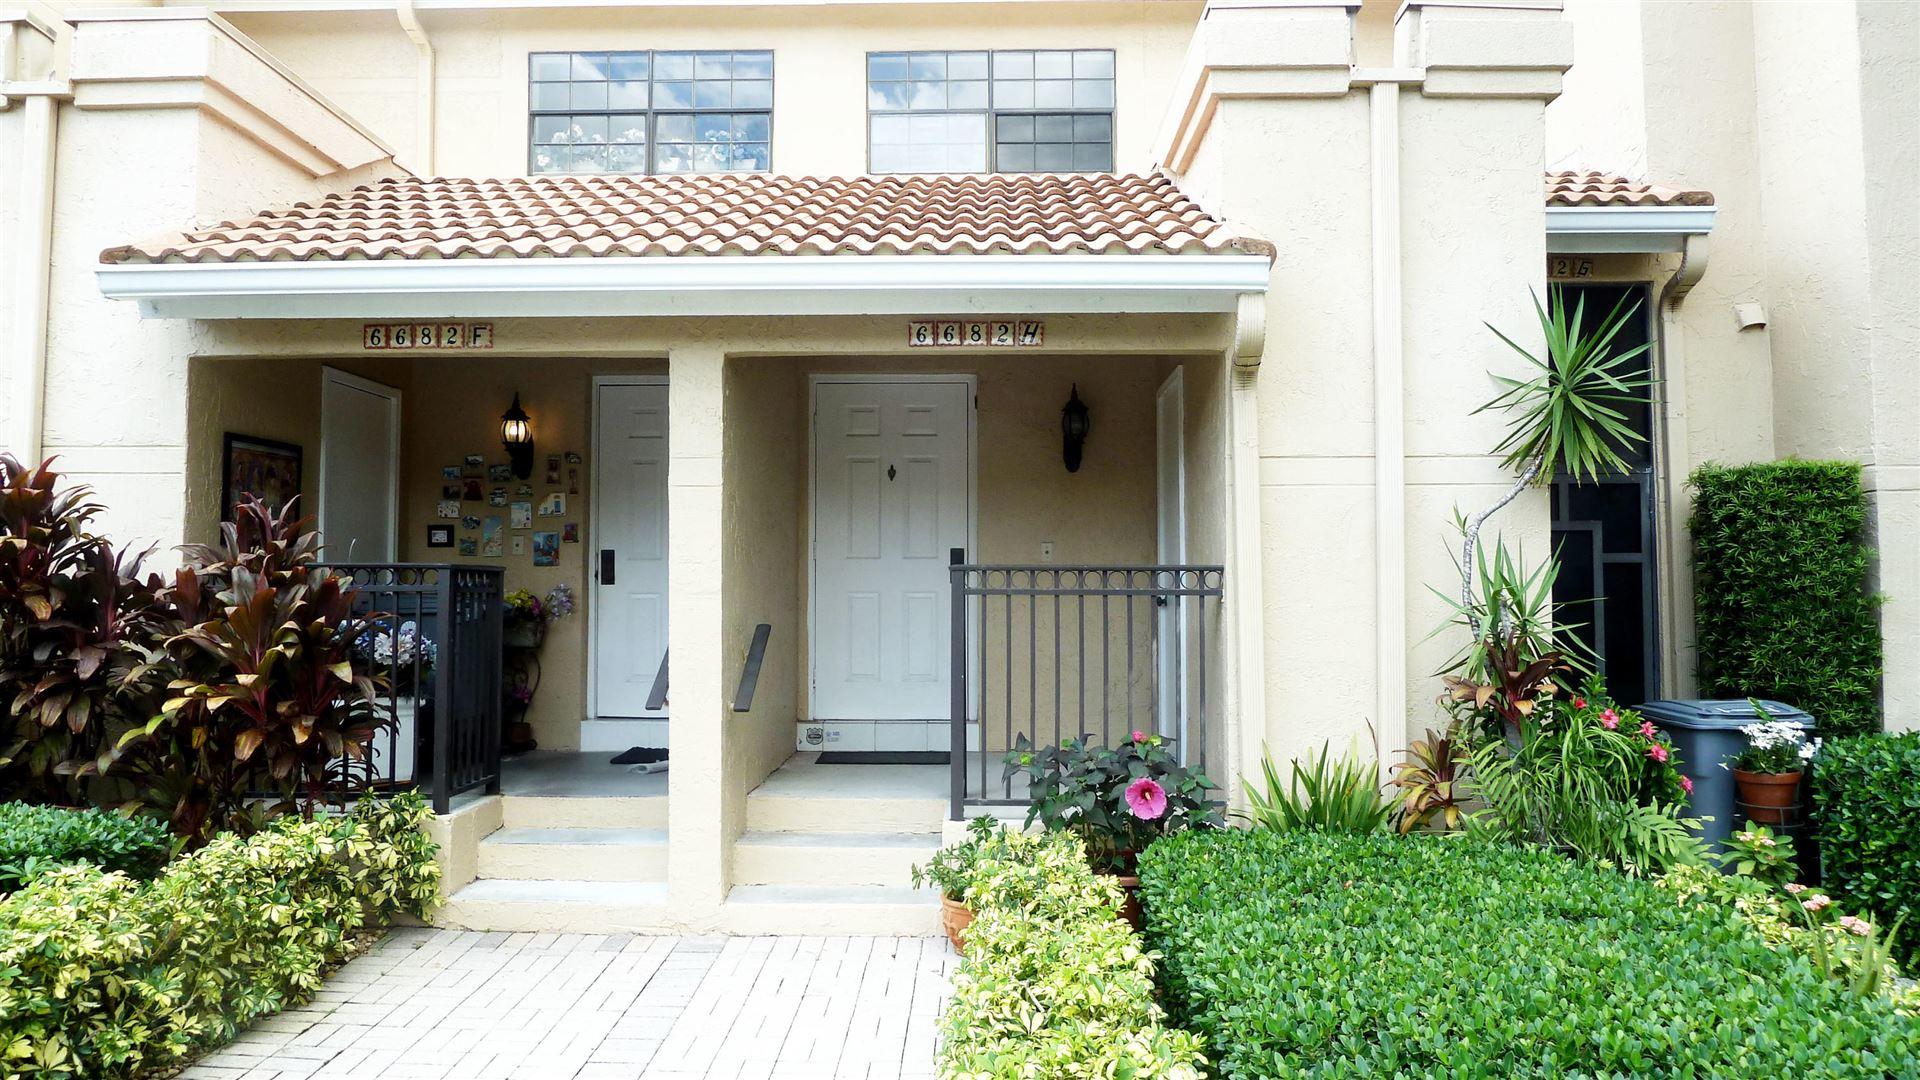 6682 Montego Bay Boulevard #H, Boca Raton, FL 33433 - #: RX-10663942